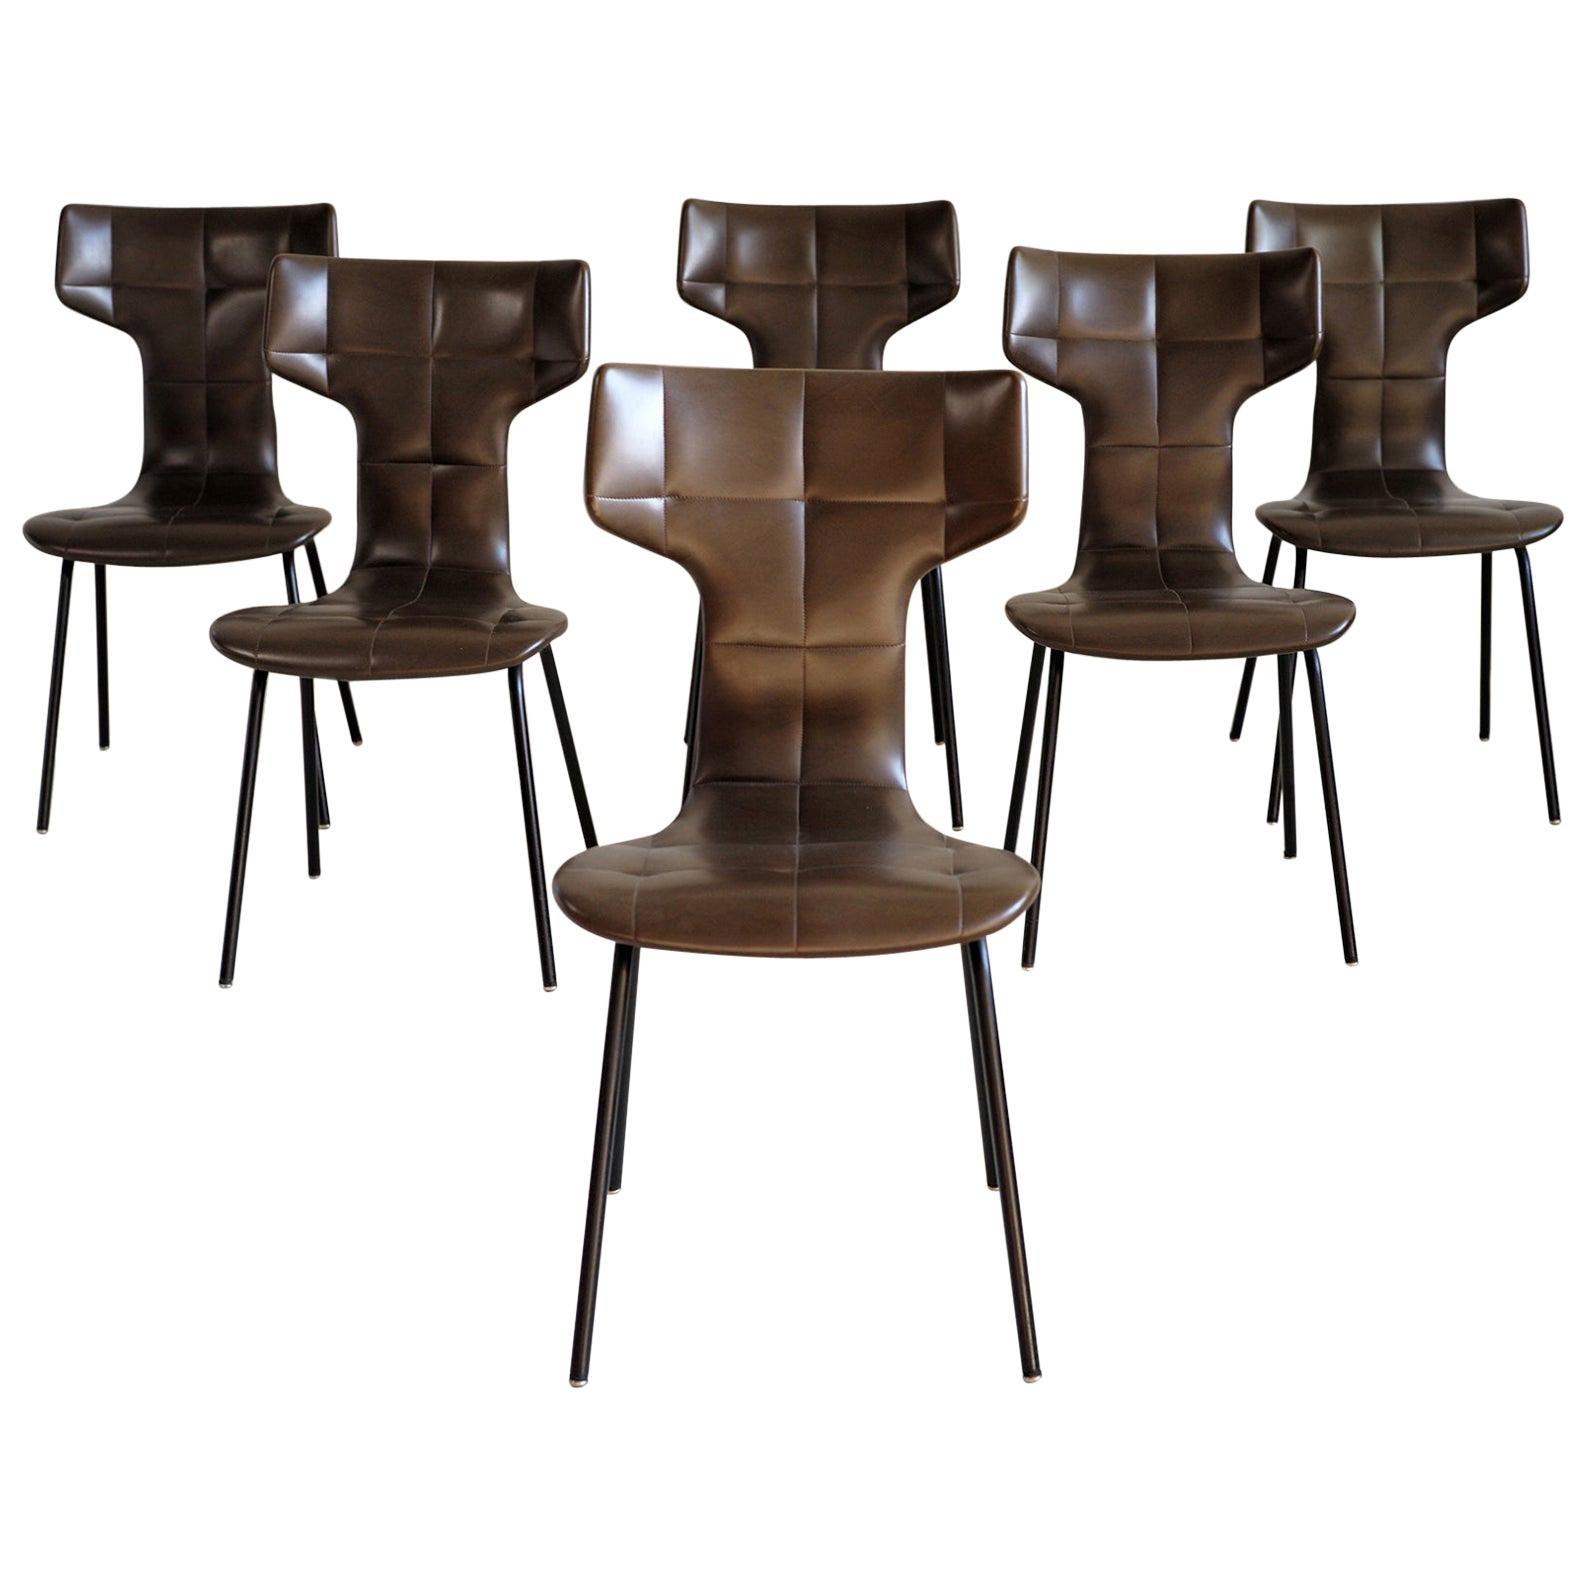 "Joseph-André Motte, Set of 6 ""Pelican"" Chairs, France, 1960"